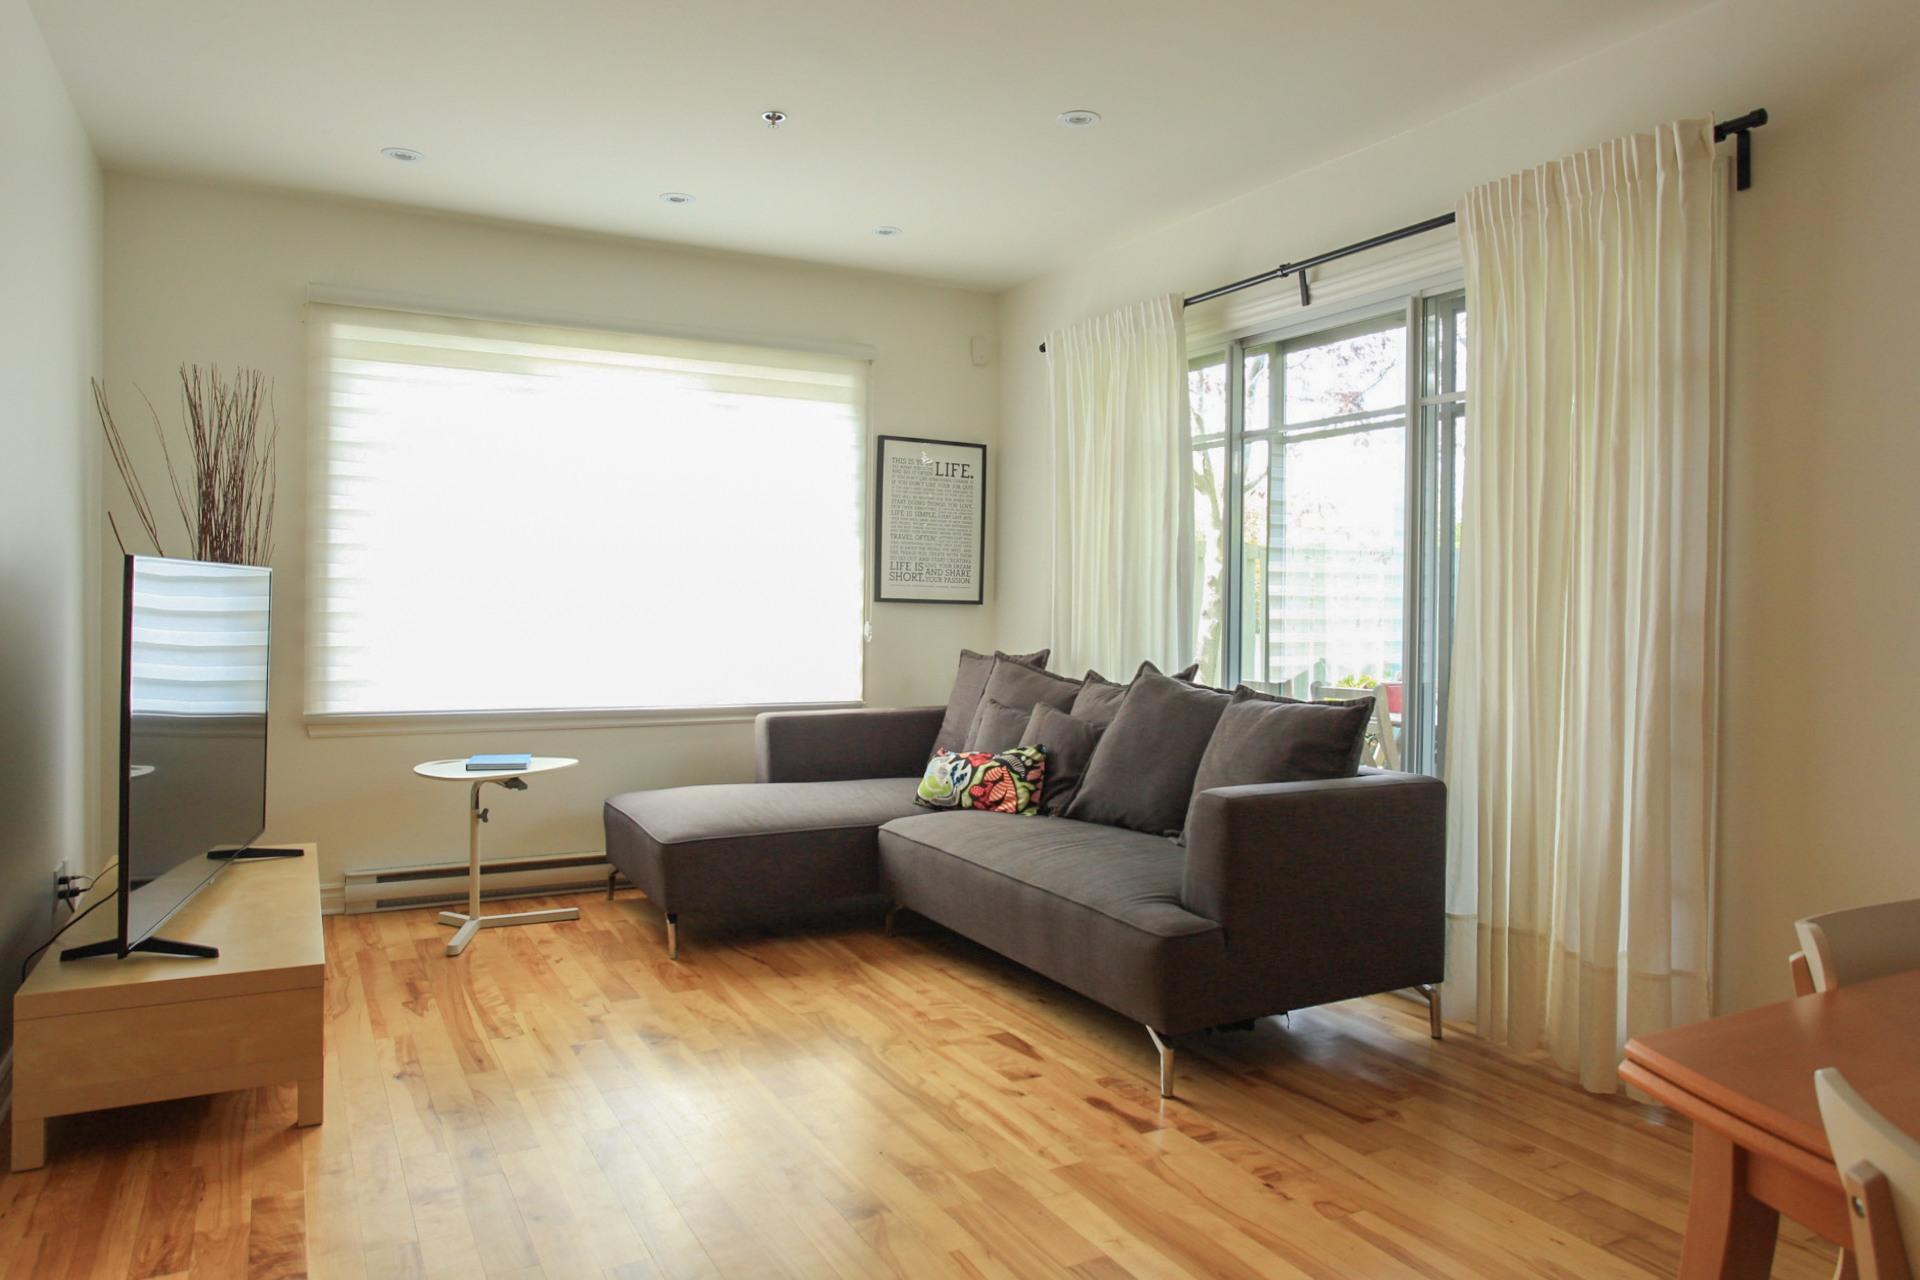 image 2 - 公寓 出租 Saint-Lambert